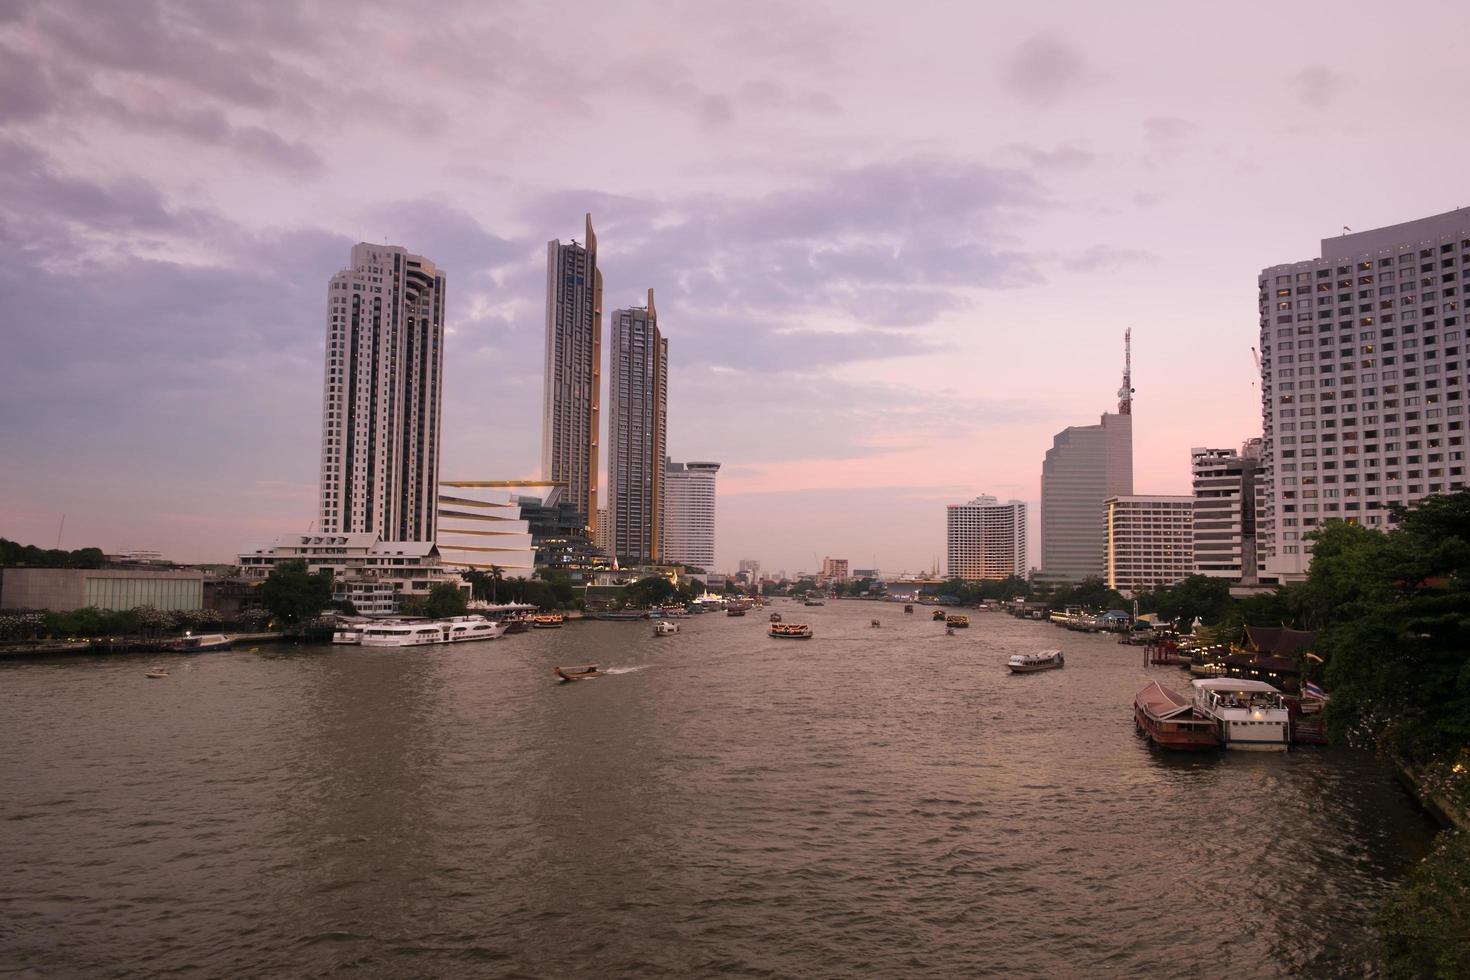 Sunset at Chao Phraya river  photo